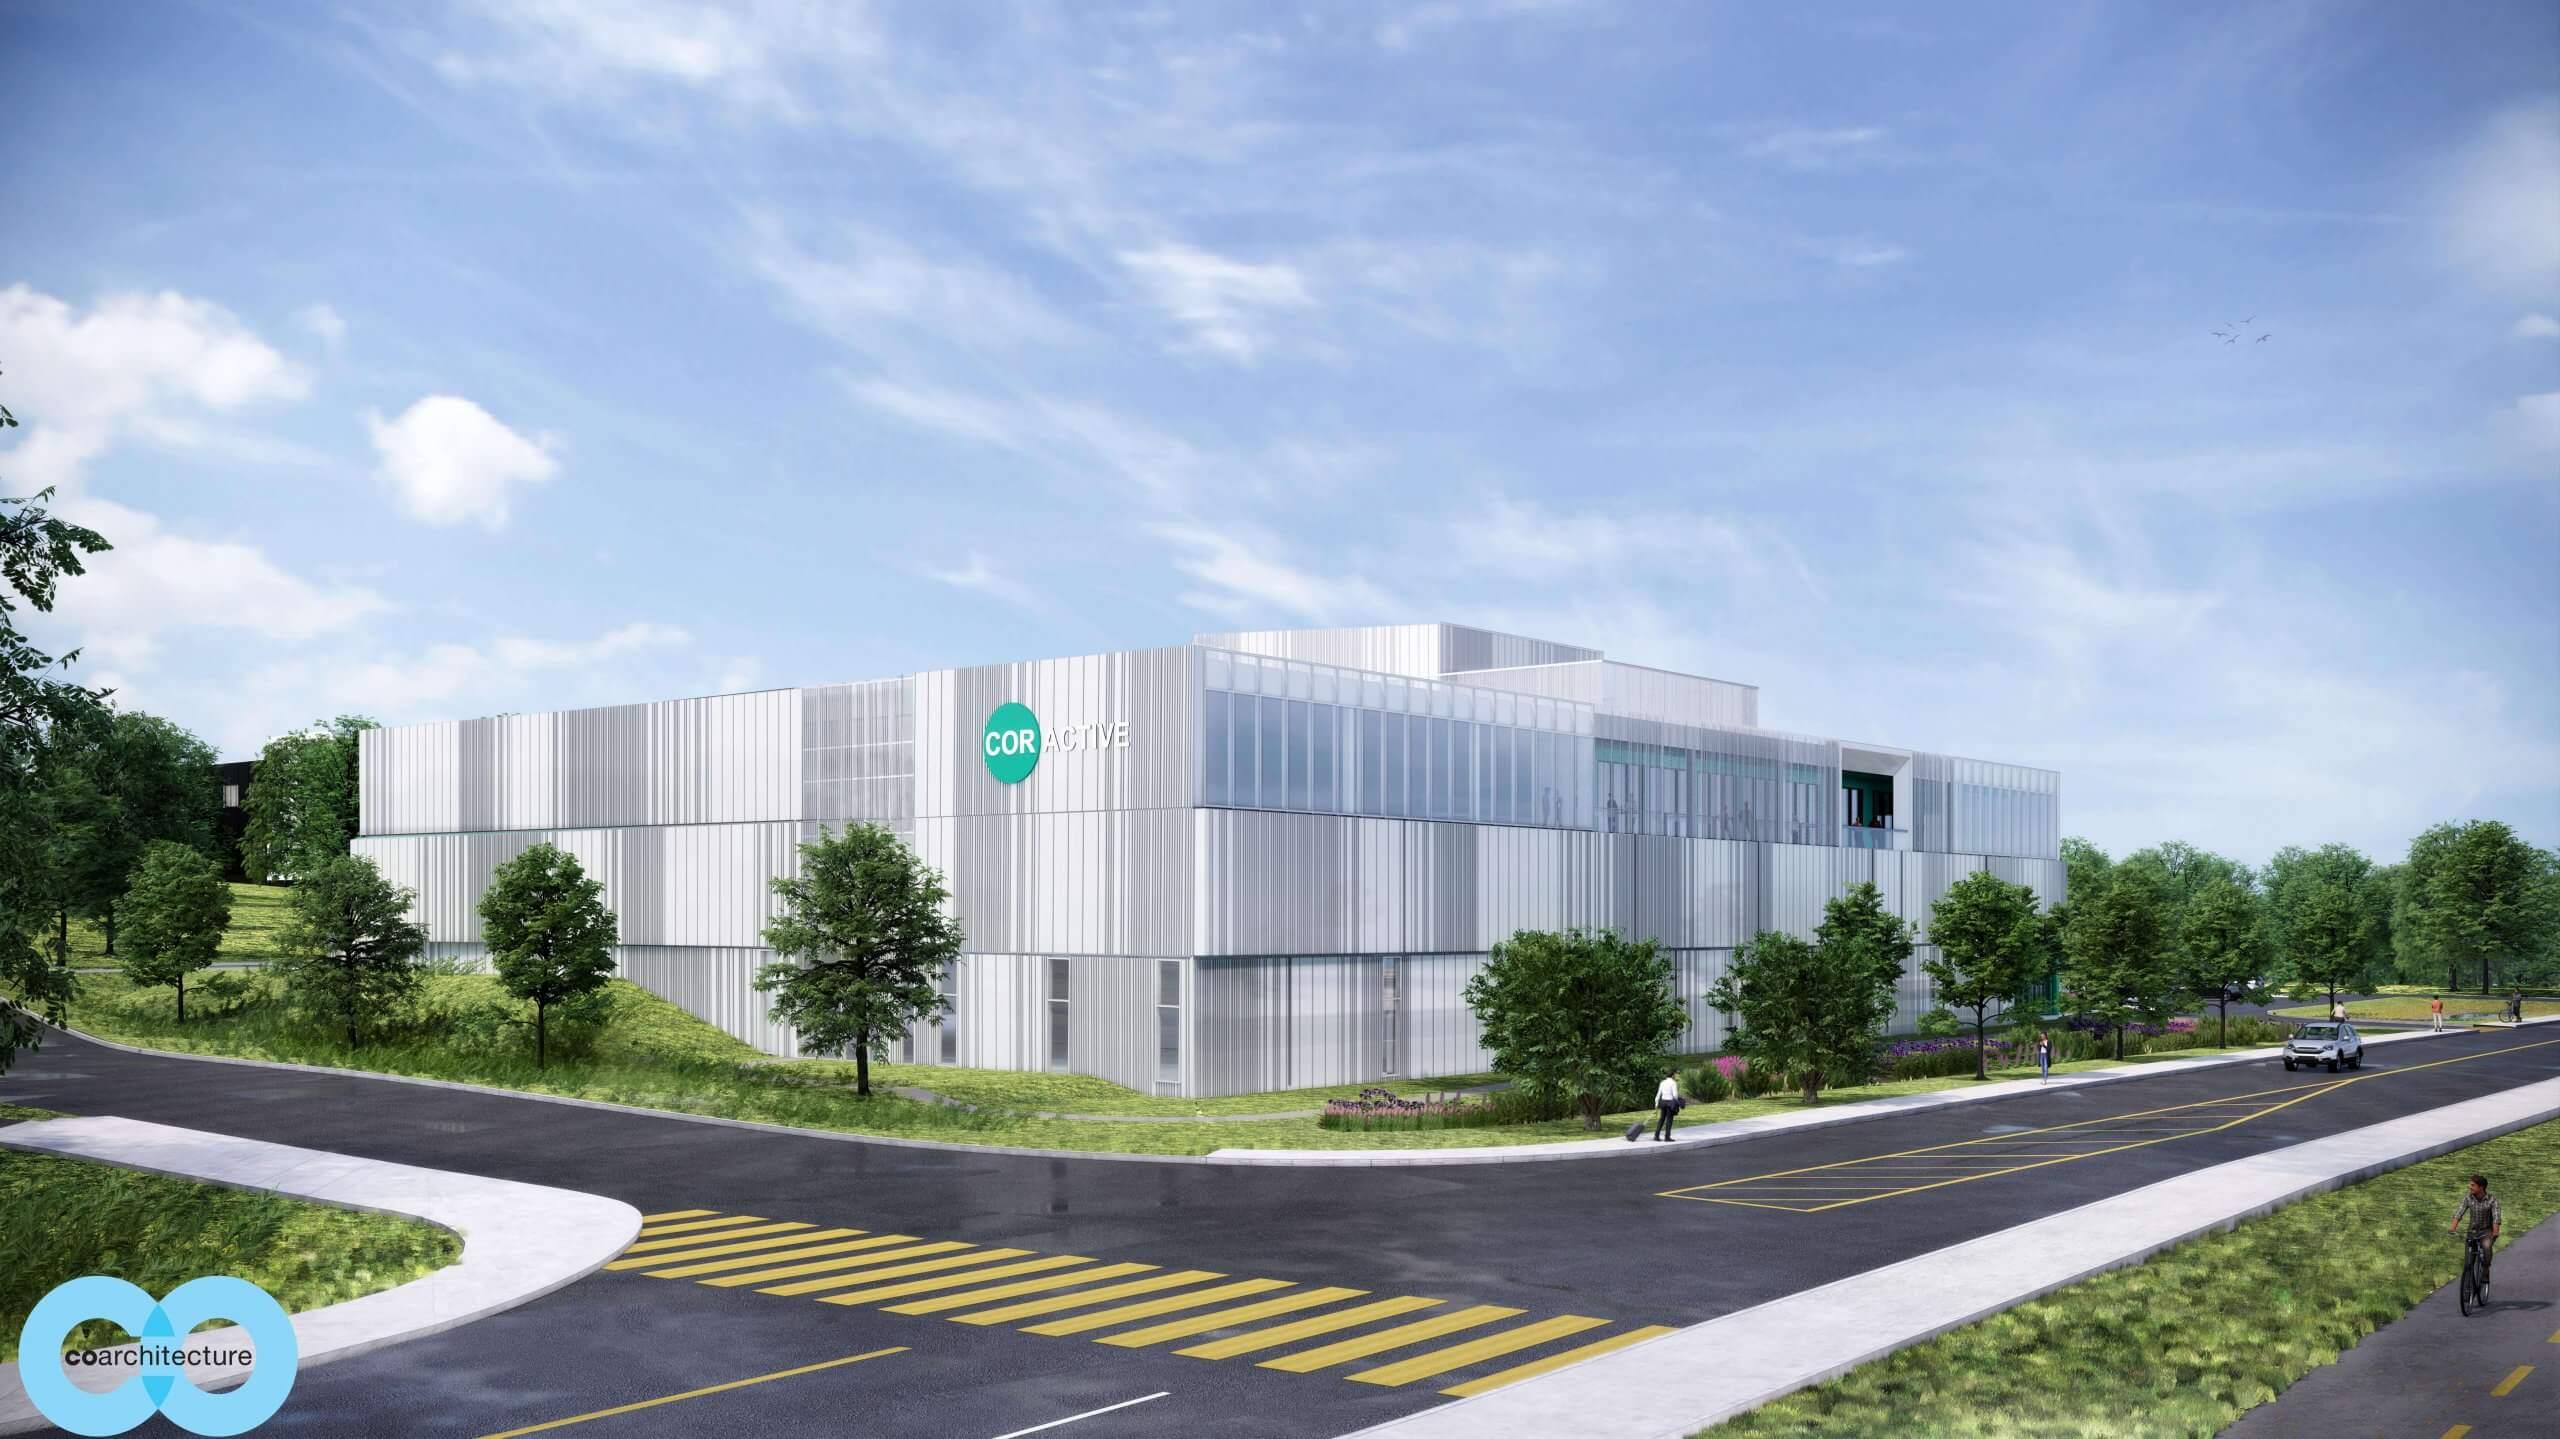 Coractive-Facade nouvelle usine